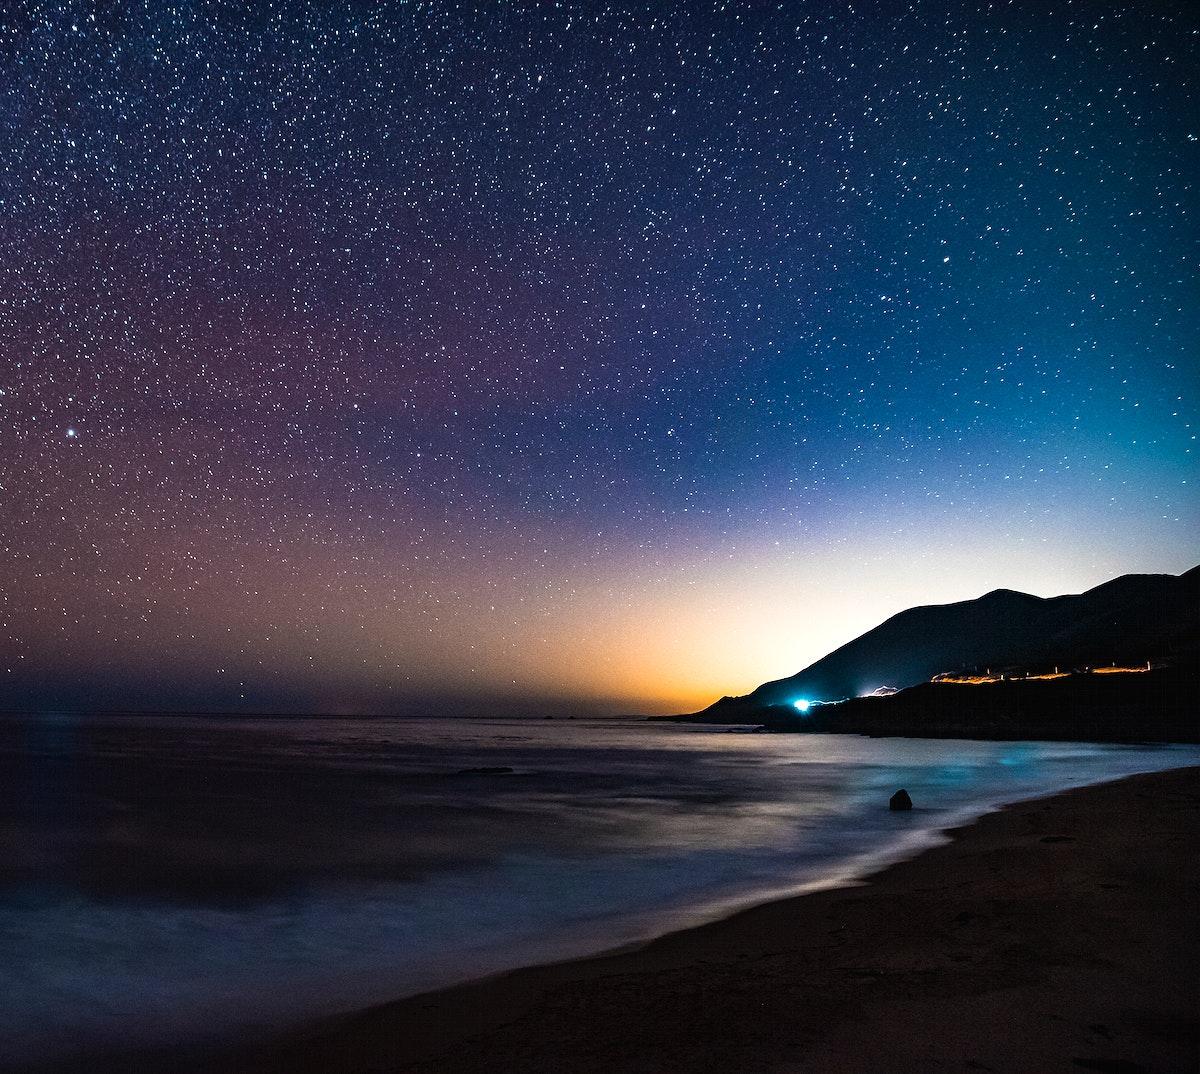 Starry night in Garrapata Beach, California, USA